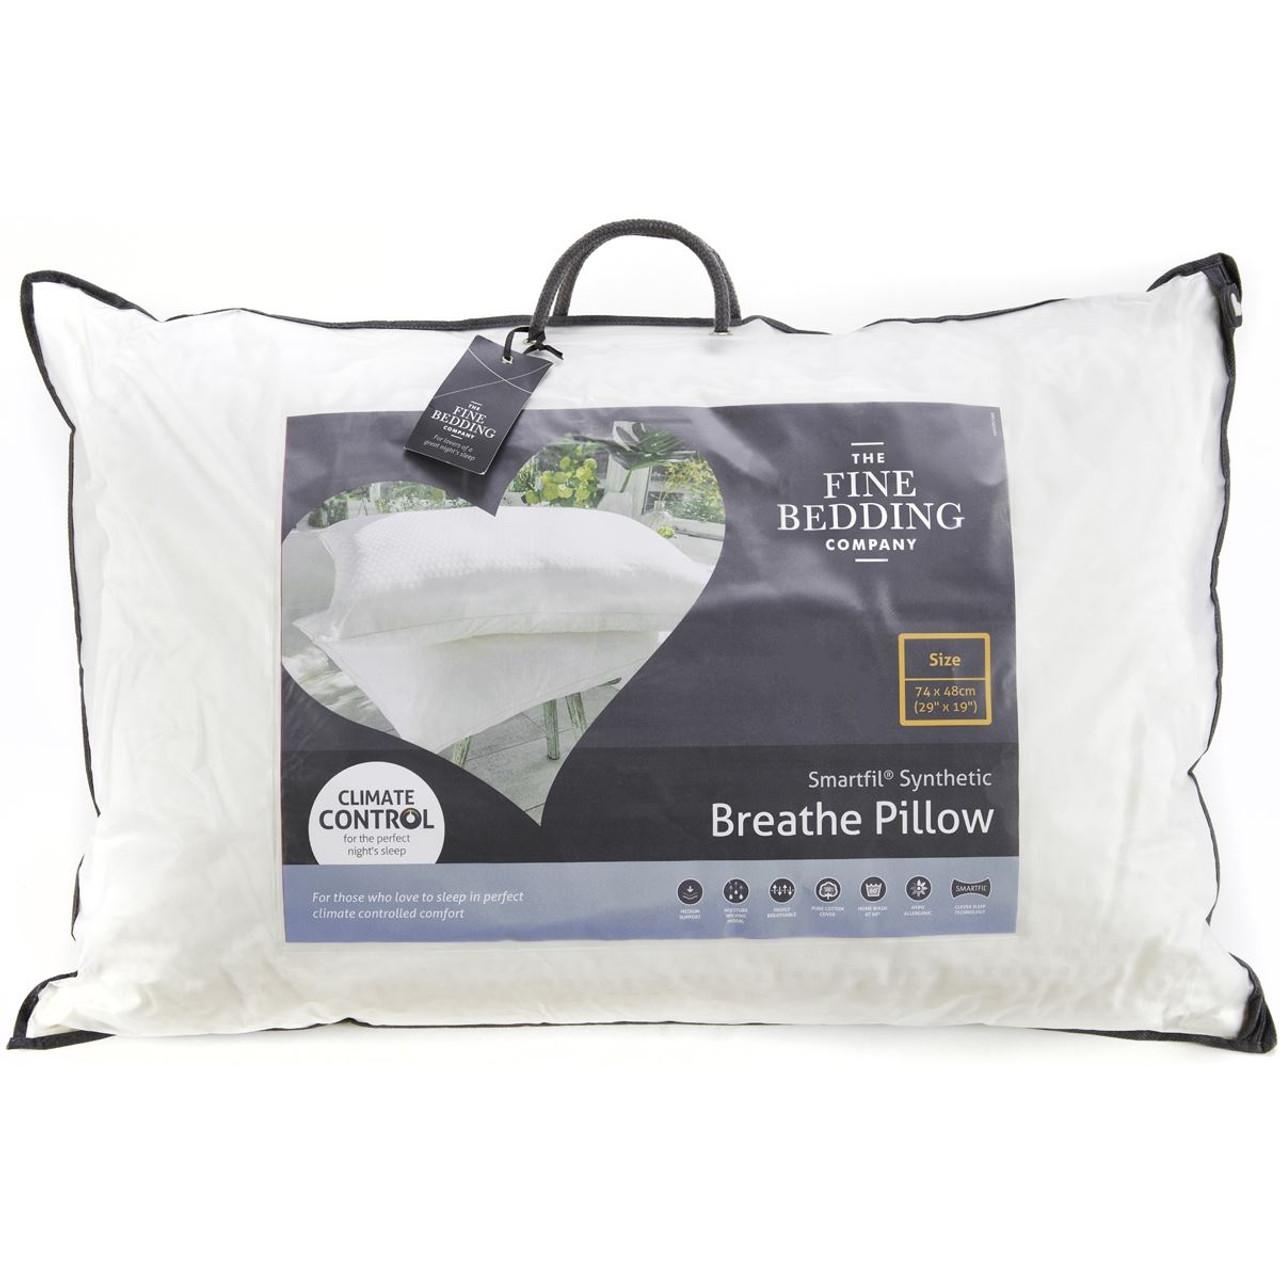 The Fine Bedding Company Breathe Pillow